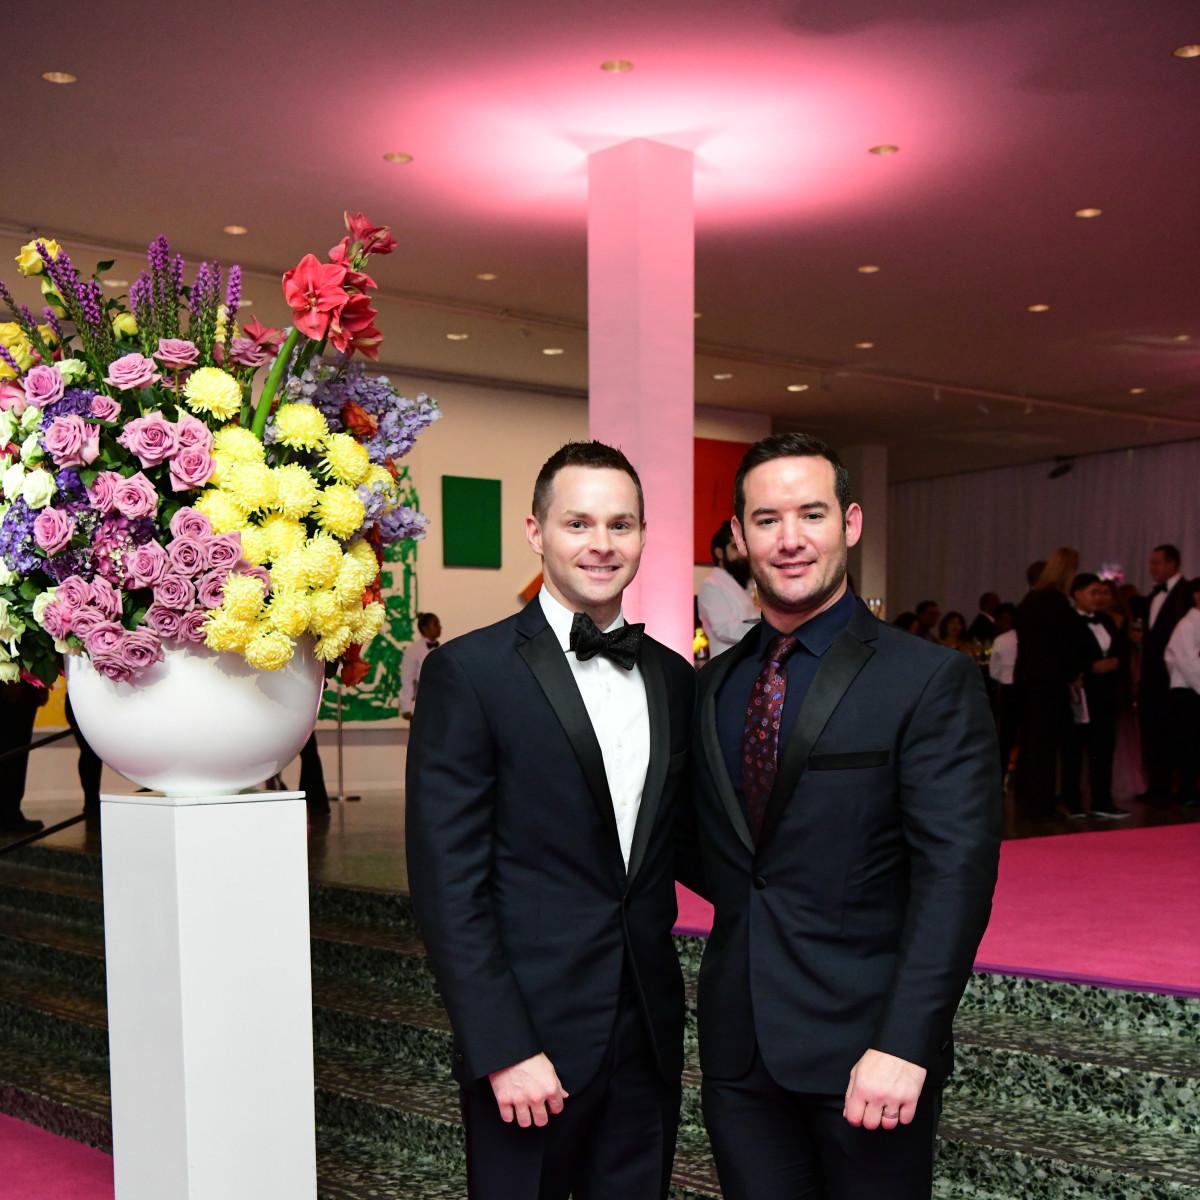 MFAH Grand Gala Ball 2019 Jerry Hooker Jacob Sudhoff